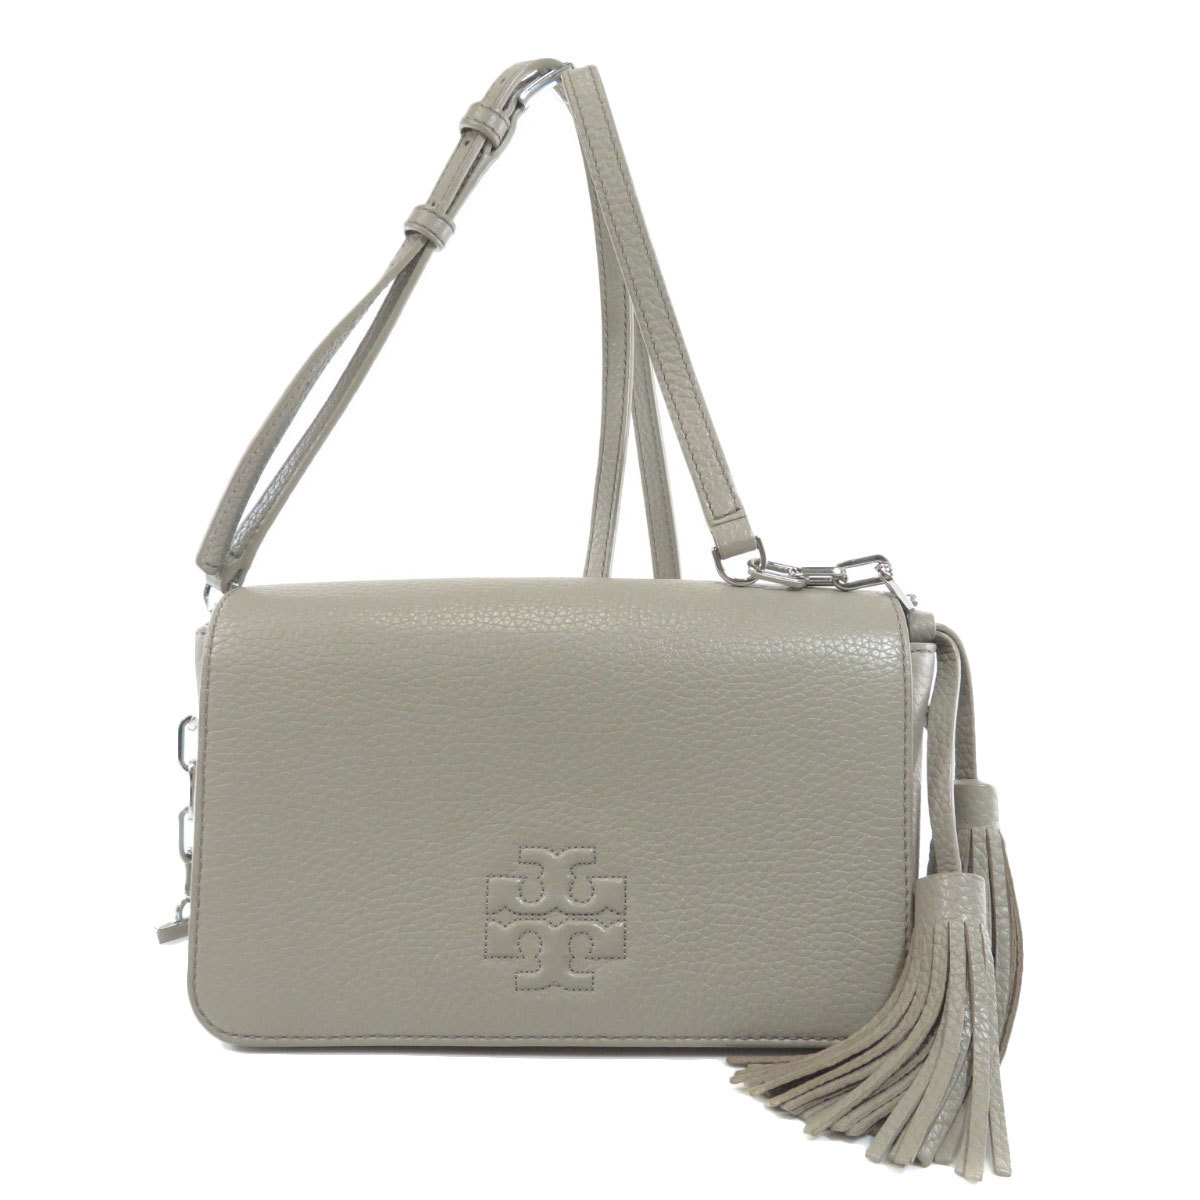 Tory Burch Tassel Motif Shoulder Bag Leather Ladies